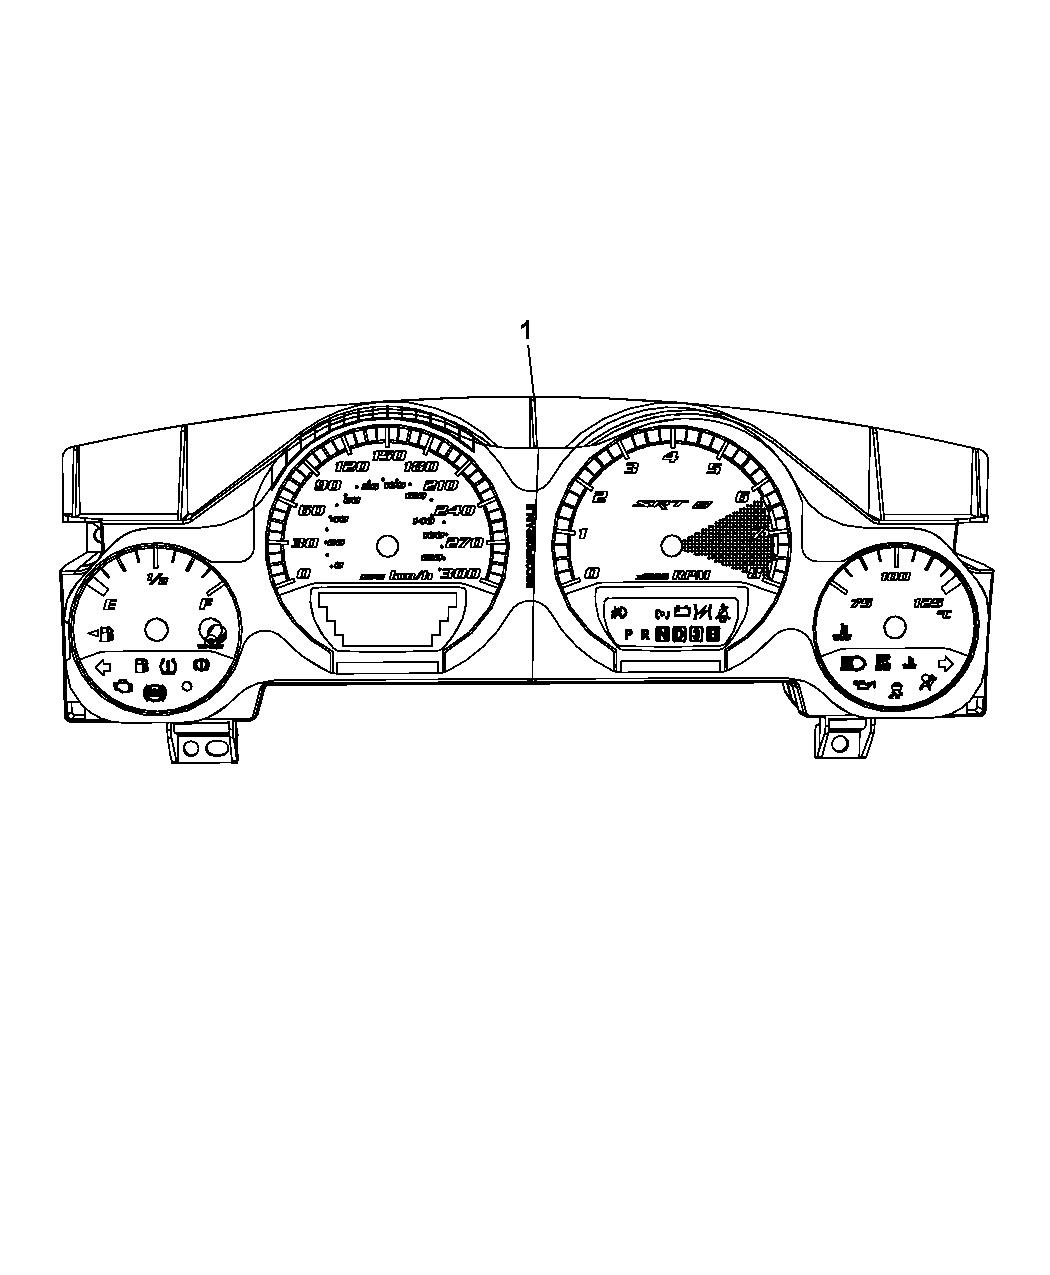 2010 Dodge Challenger Instrument Panel Cluster